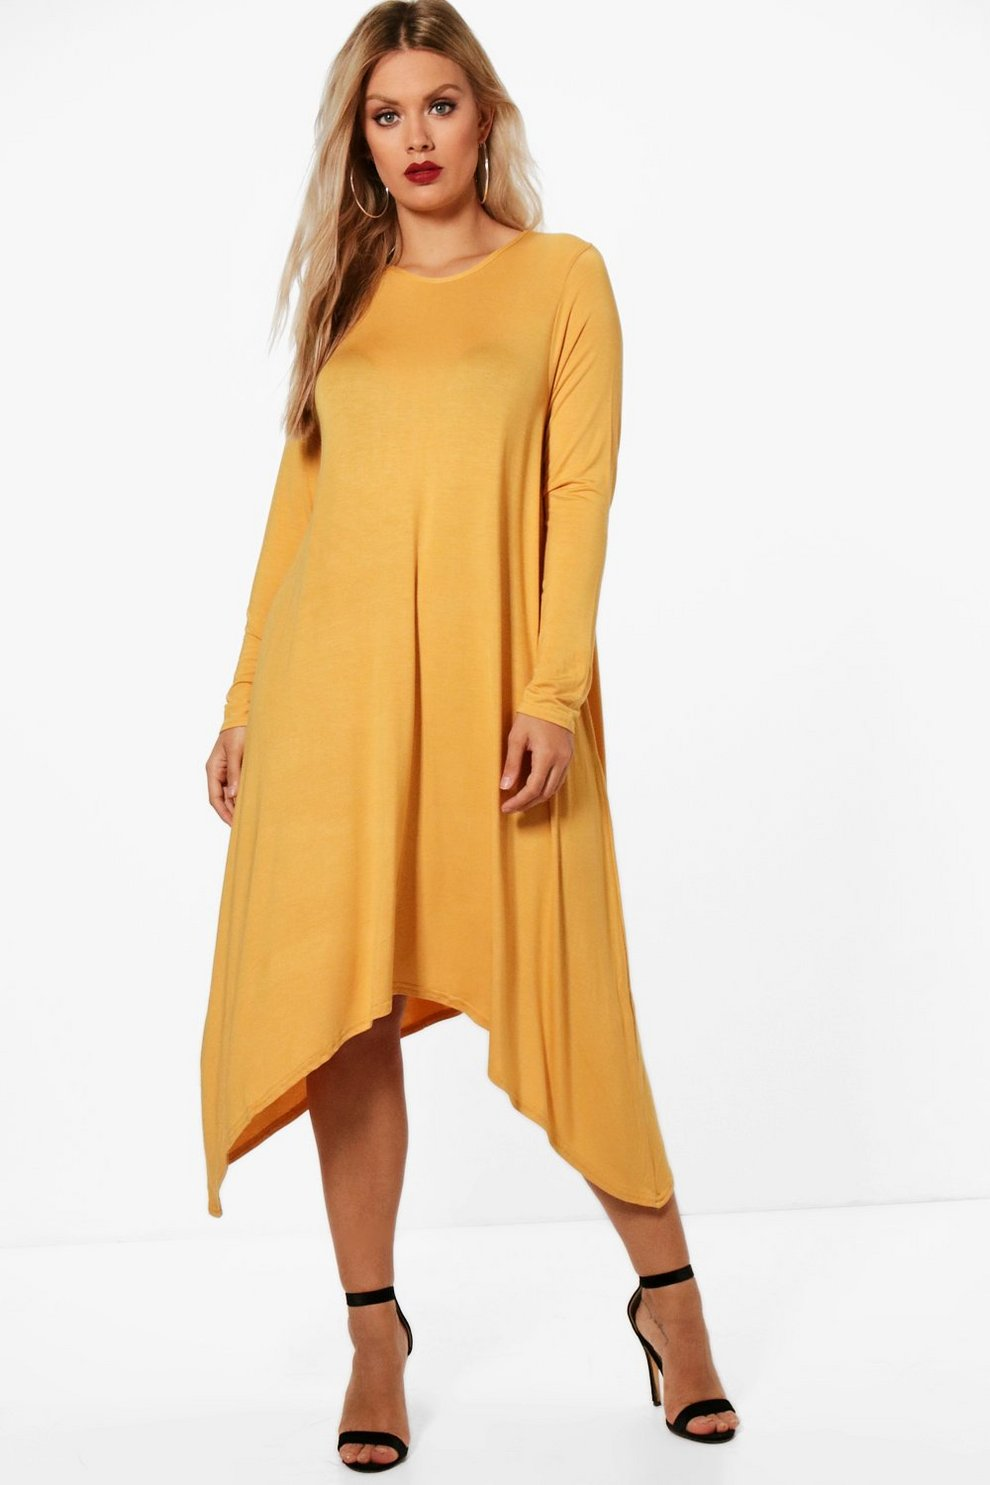 552eb0b93f299 Plus Long Sleeve Hanky Hem Swing Dress